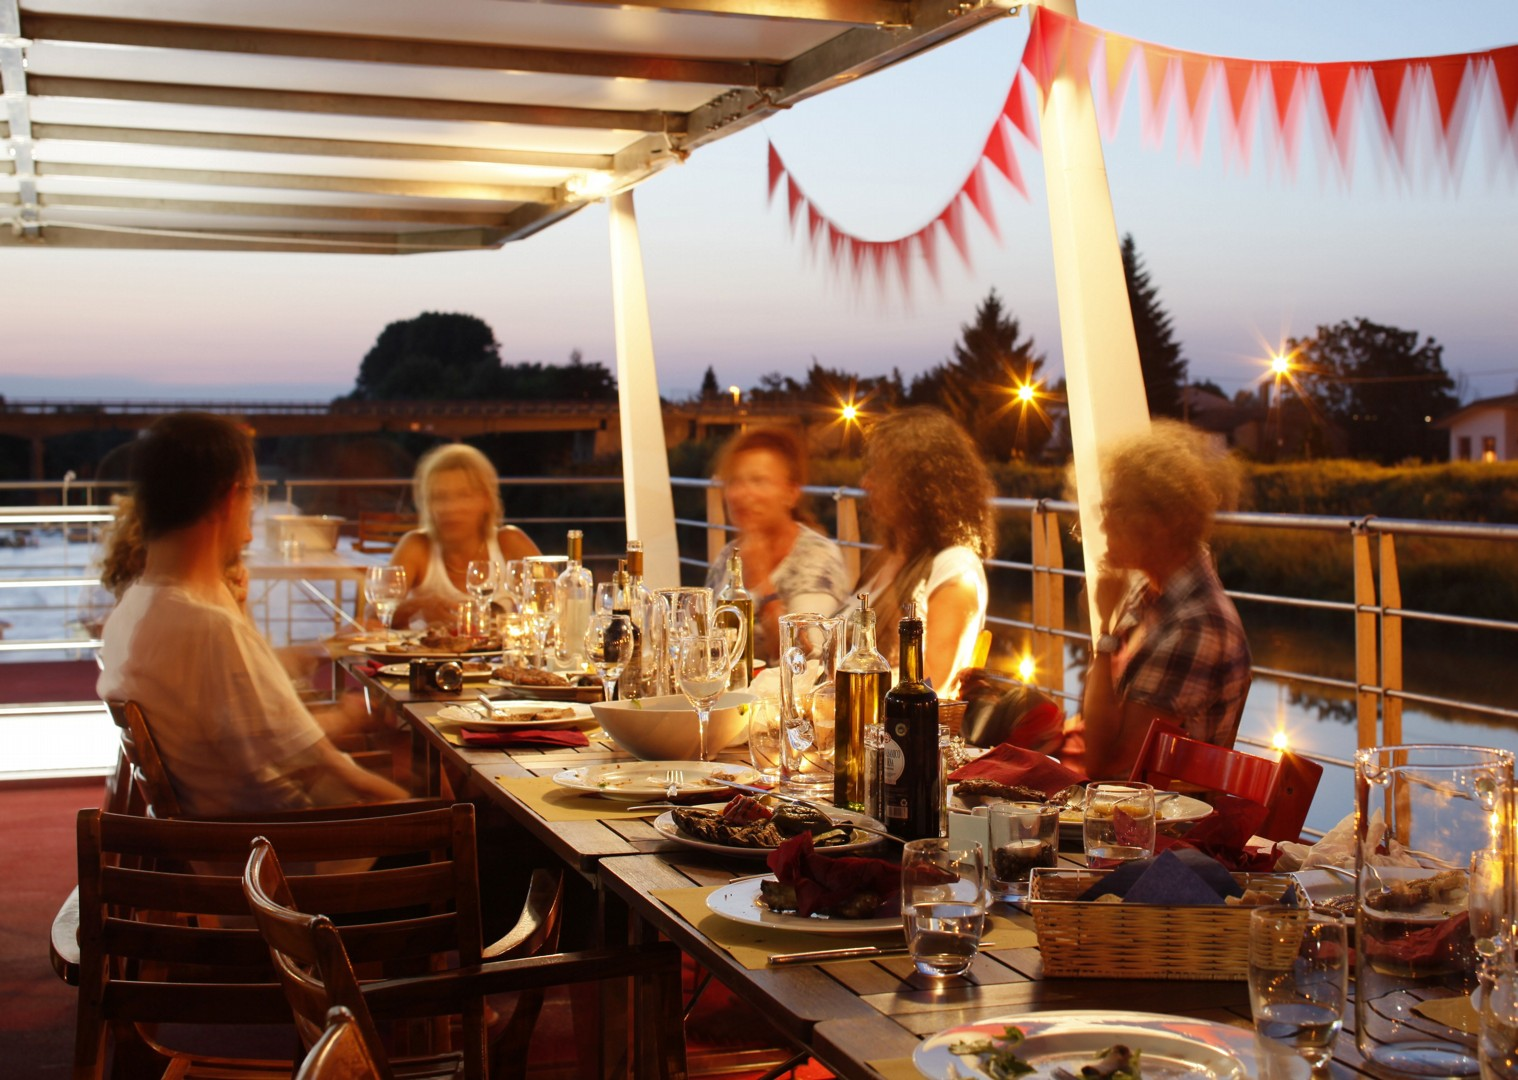 waterwaysofvenice16.jpg - Italy - Venetian Waterways (Venice to Mantova) - Bike and Barge Holiday - Leisure Cycling